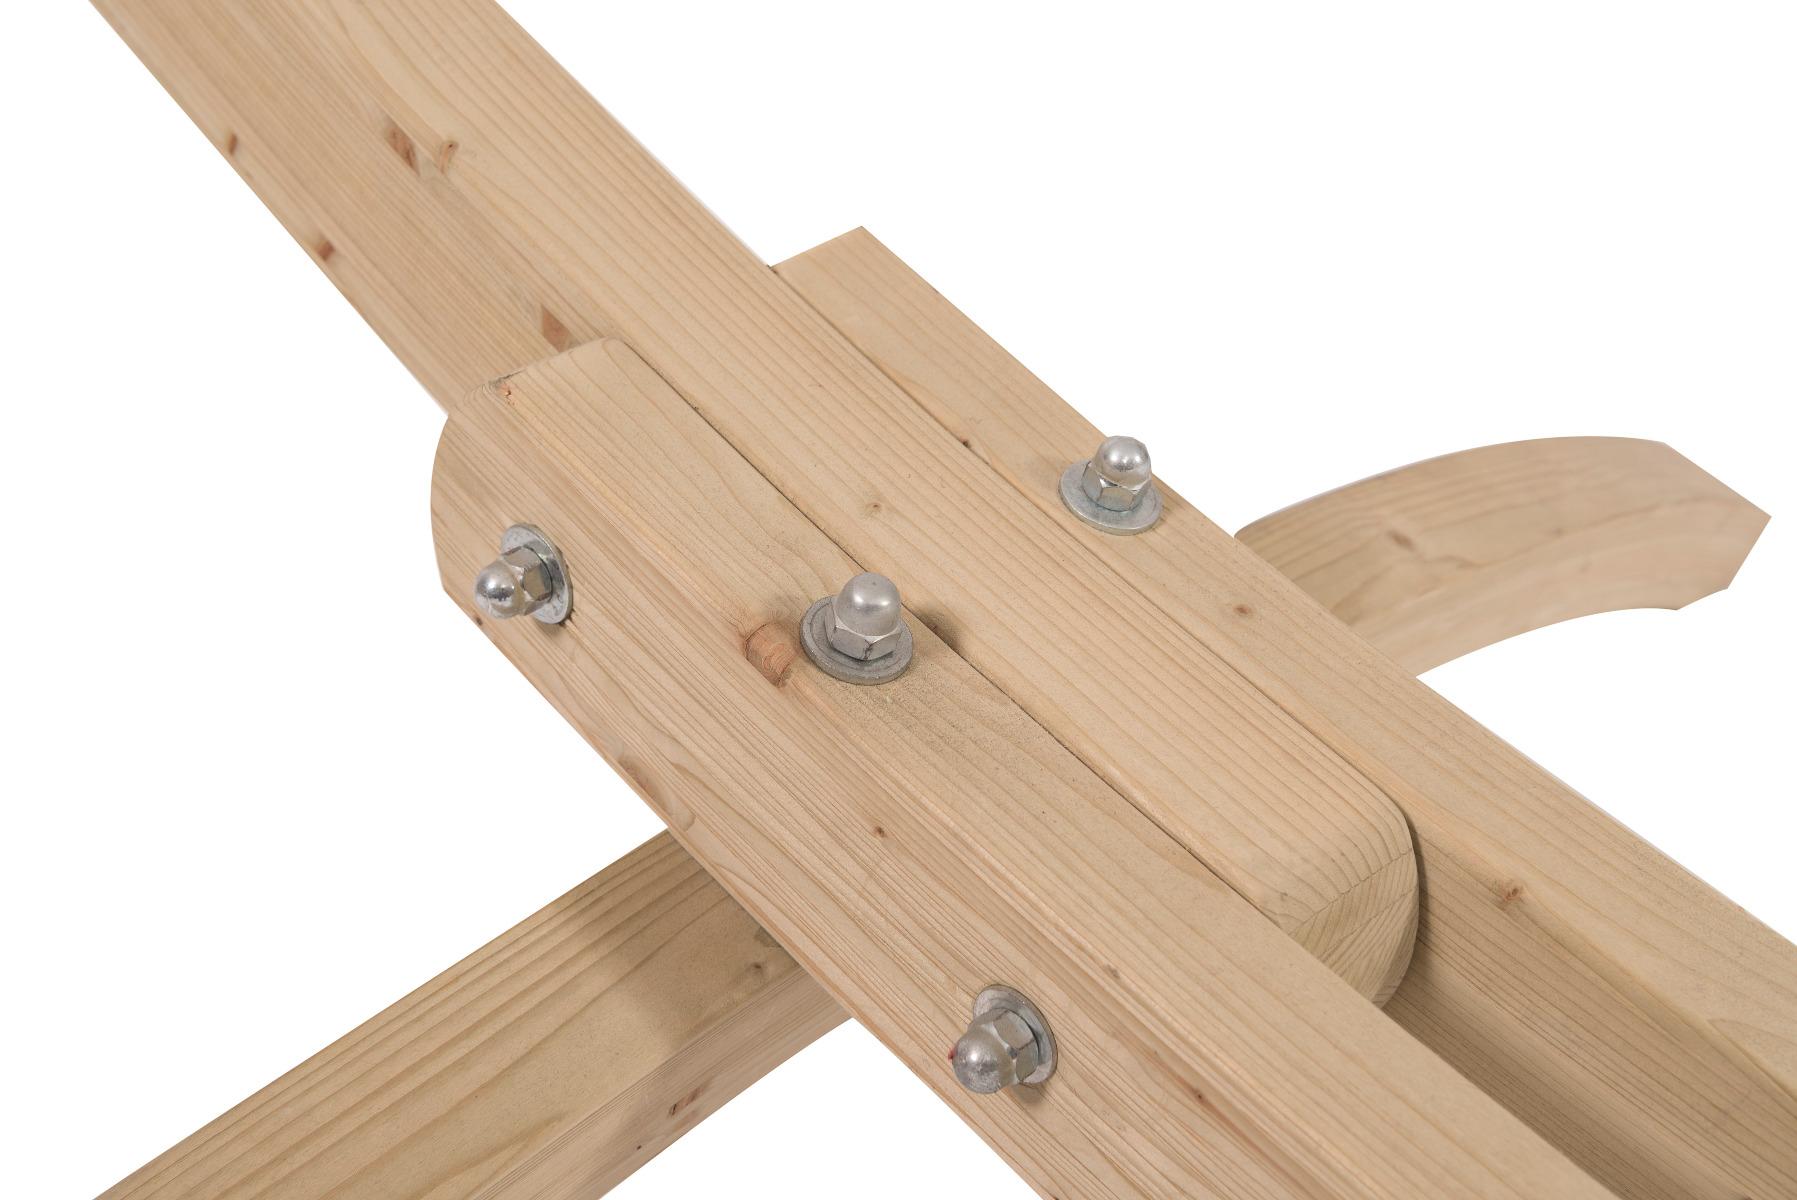 Hangmatstandaard 'Wood' familie